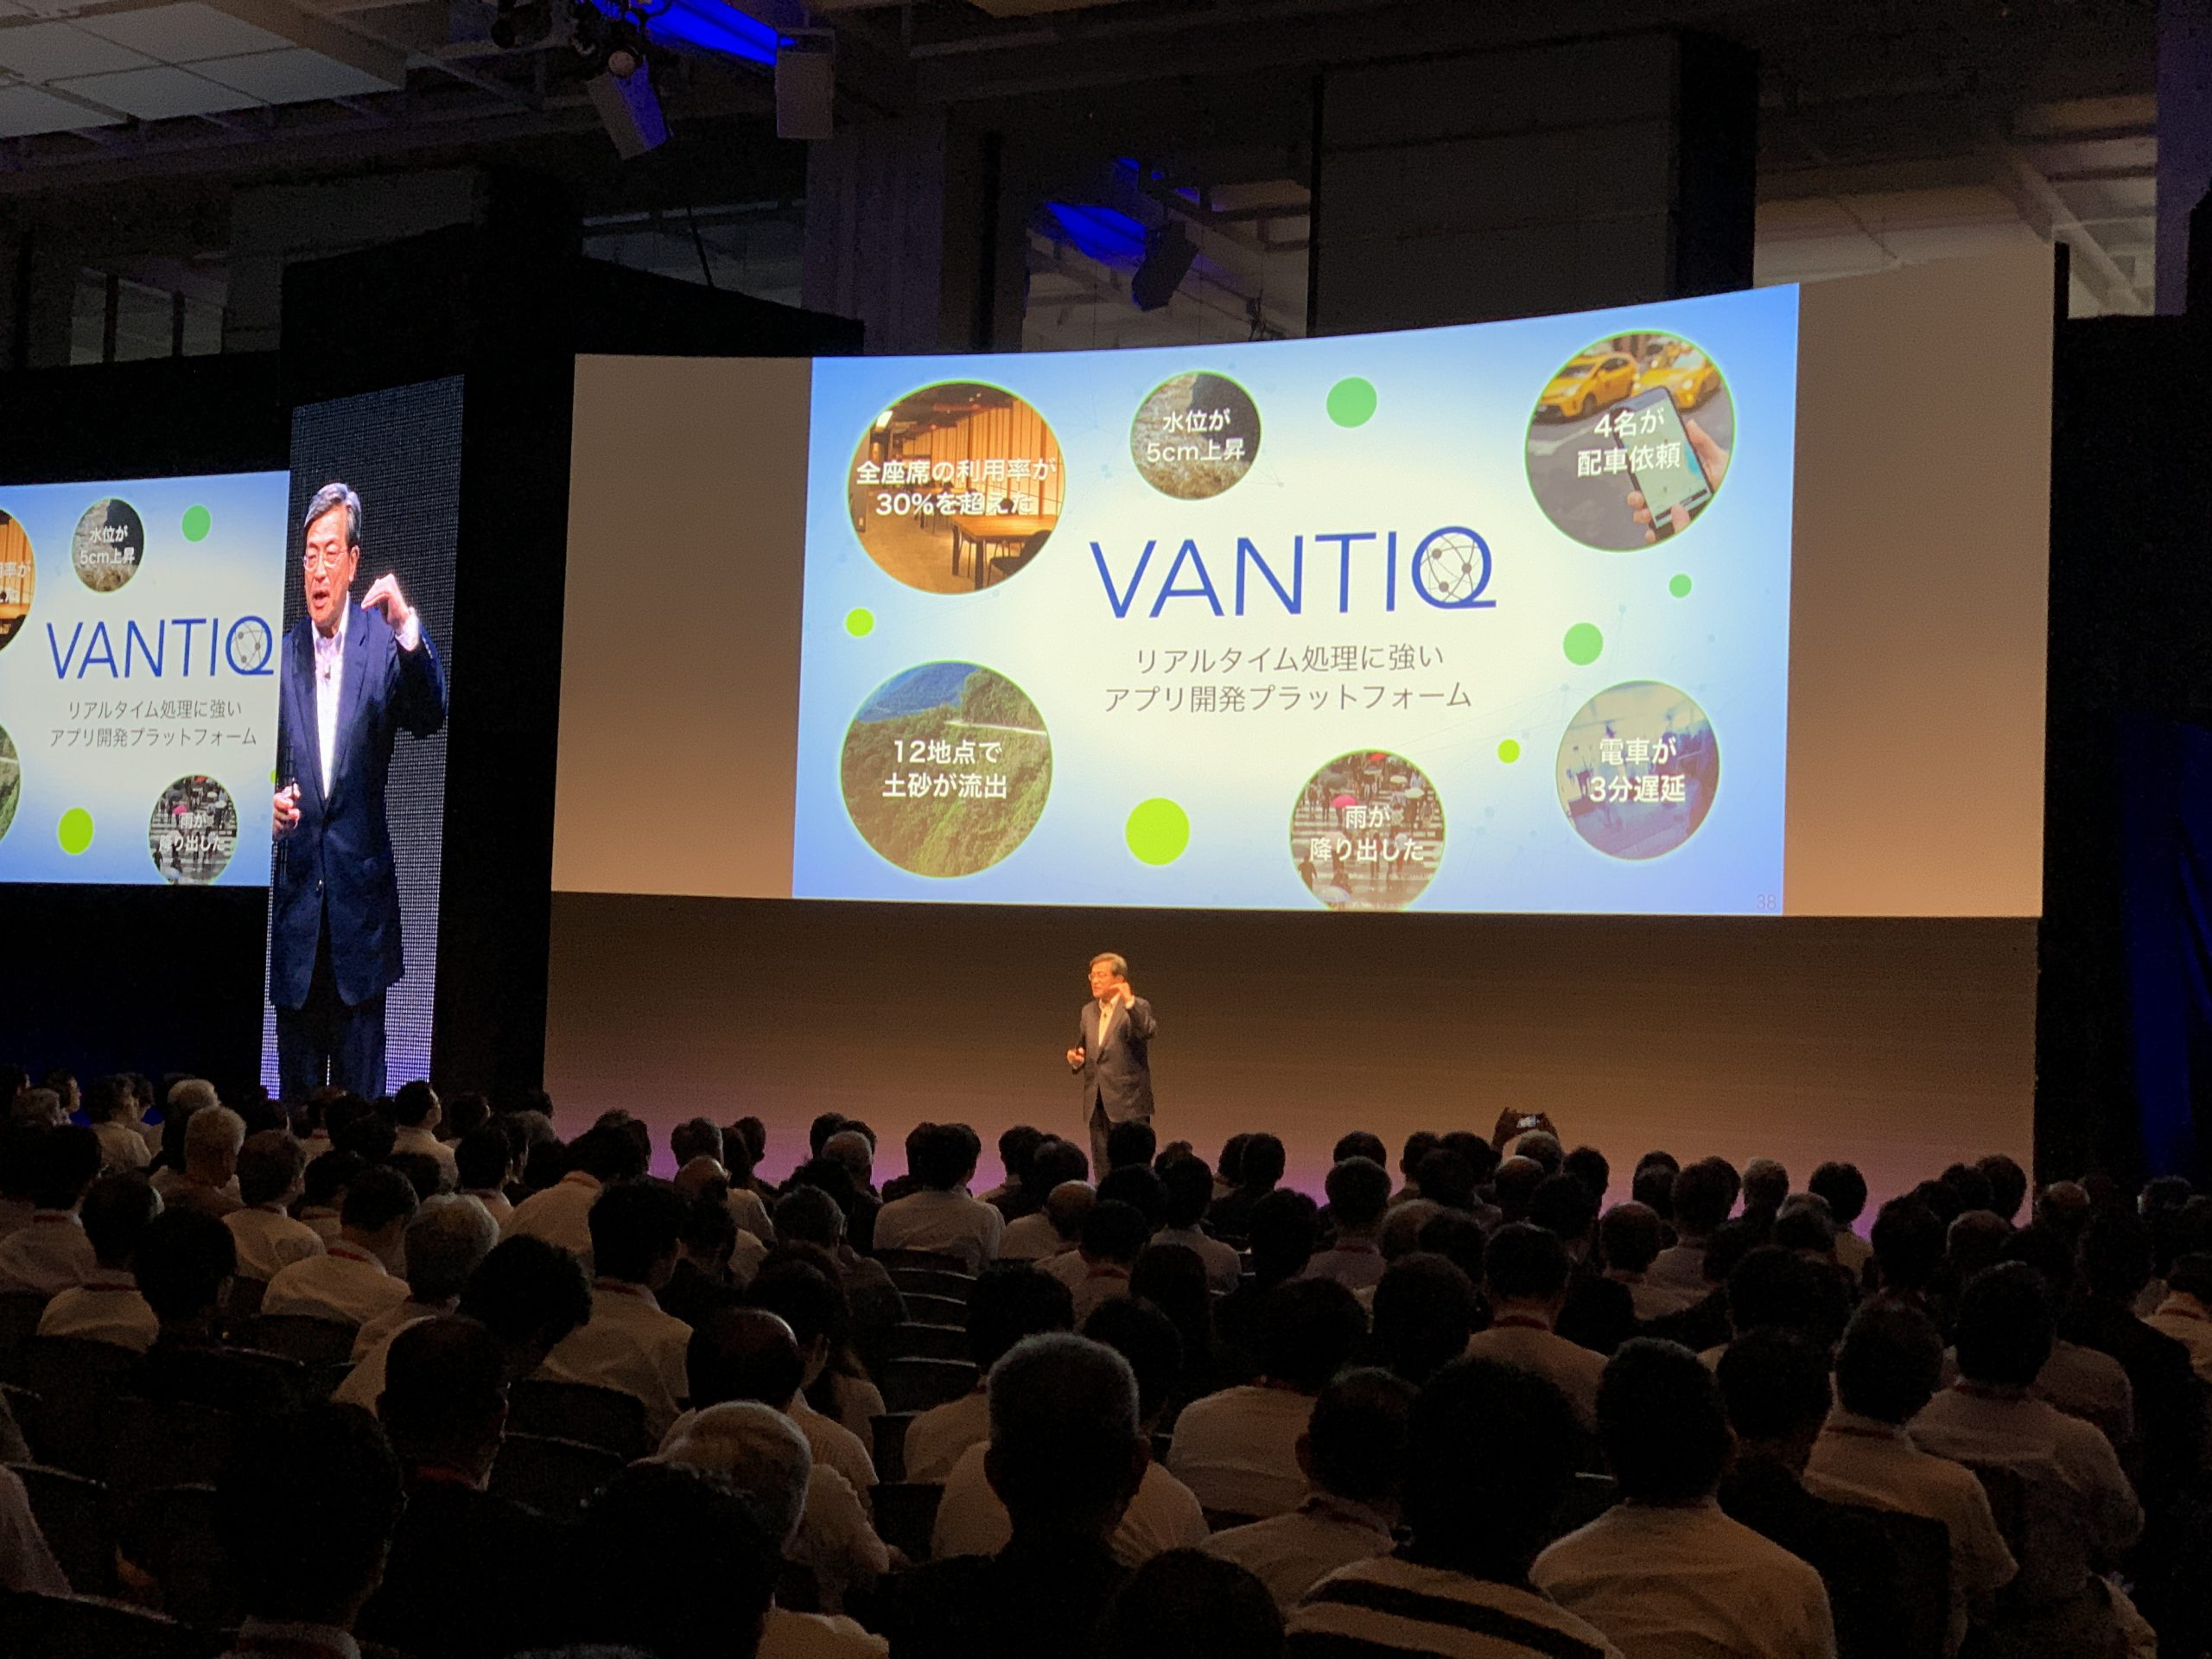 SoftBank COO presents on VANTIQ at SoftBank World 2019